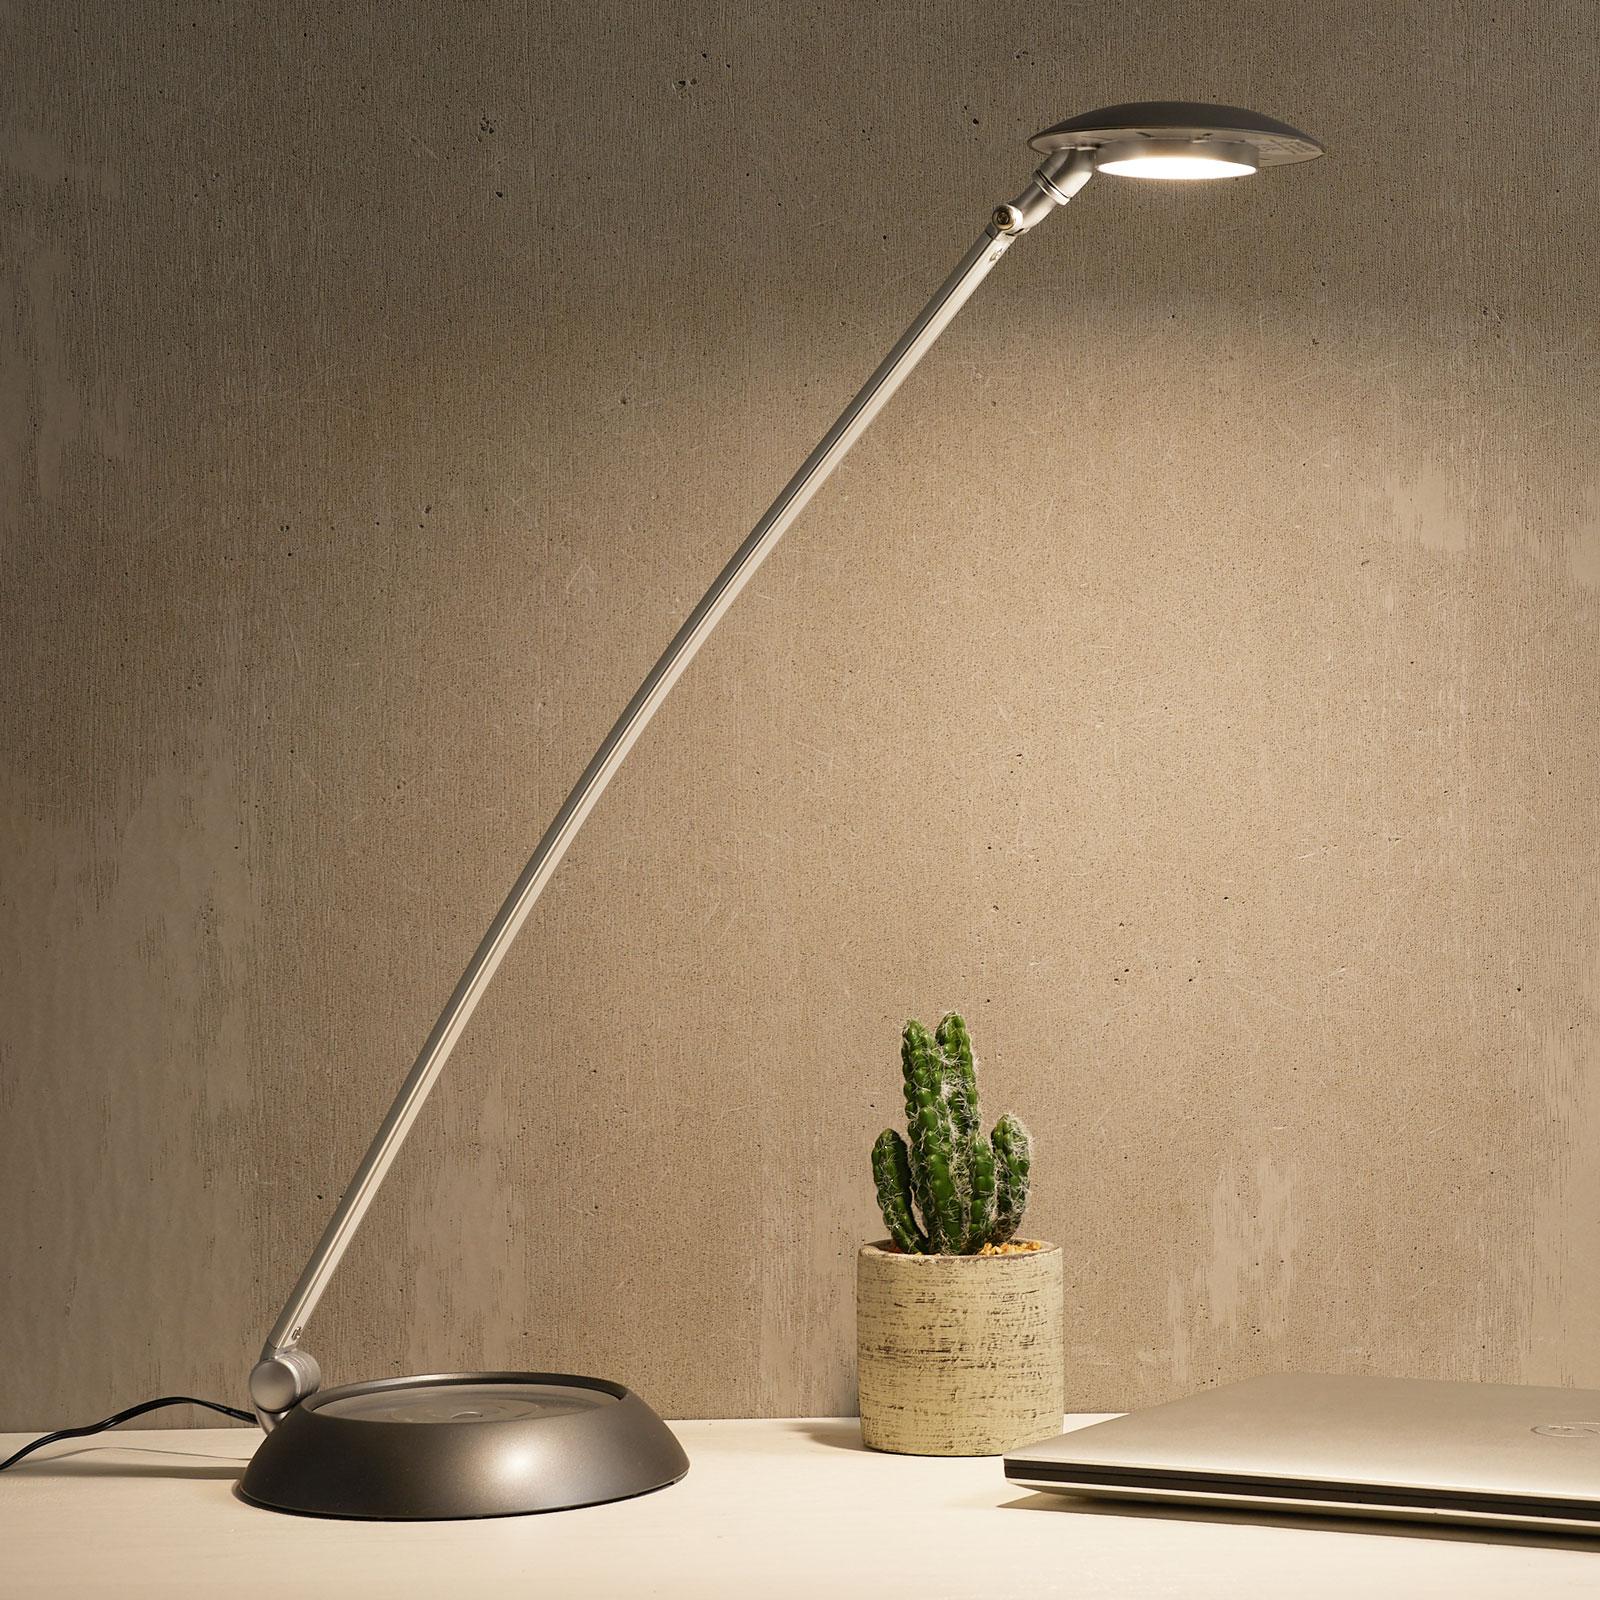 Regulowana lampa stołowa LED FOREVER, 6 W